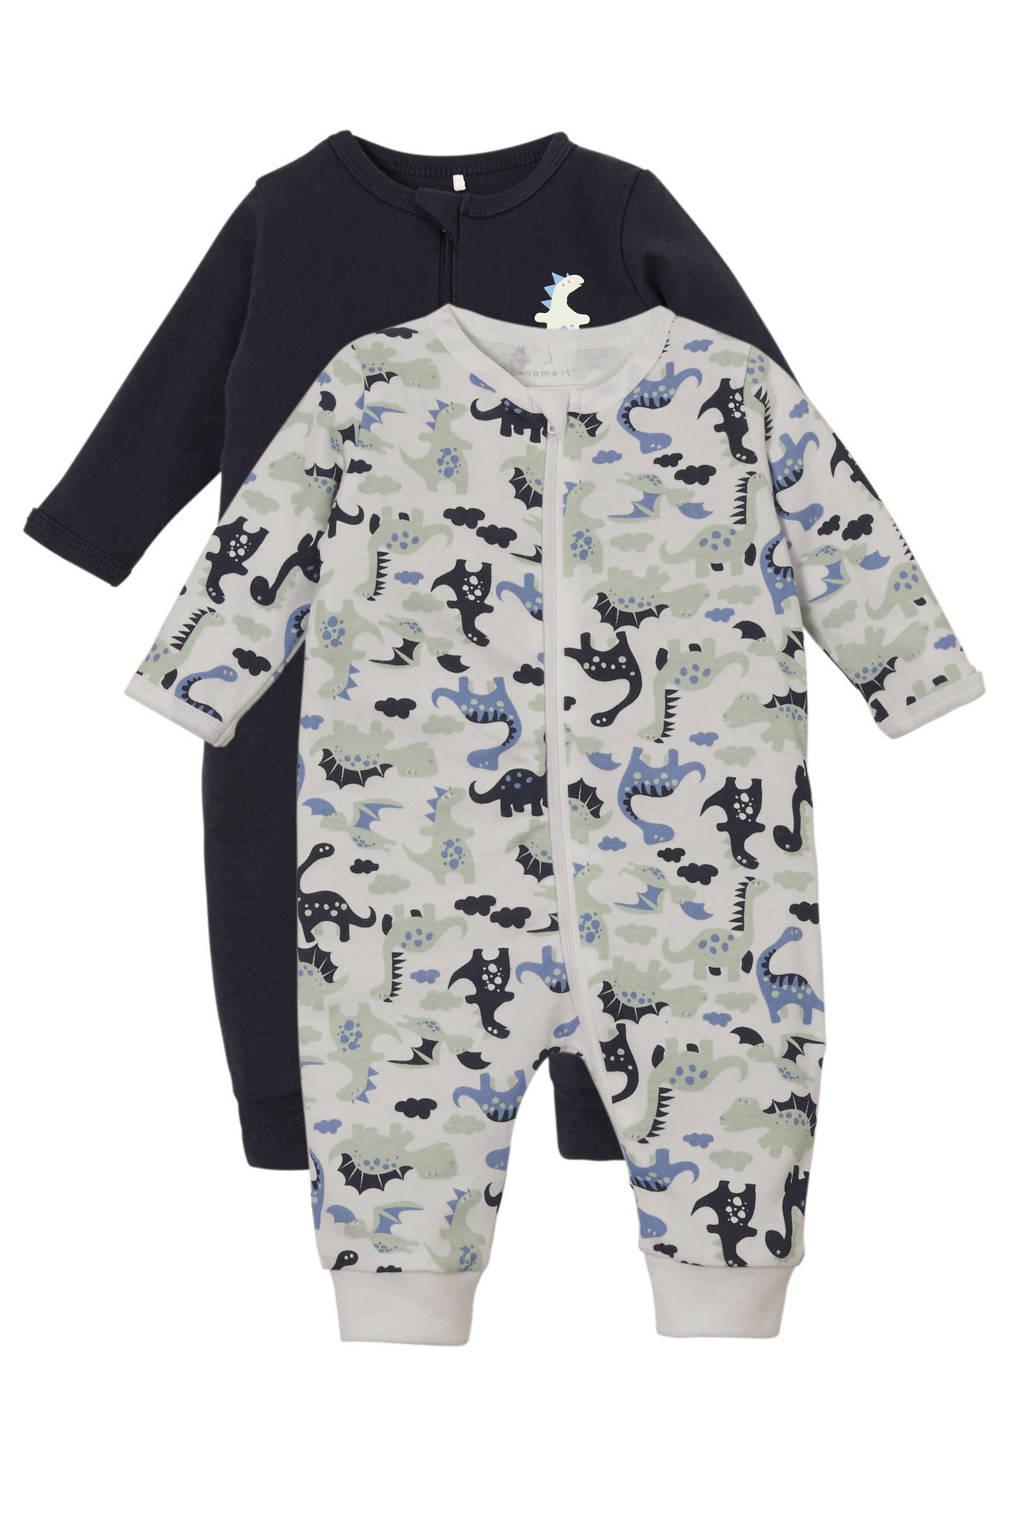 NAME IT BABY   newborn baby pyjama - set van 2, Donkerblauw/mint/wit